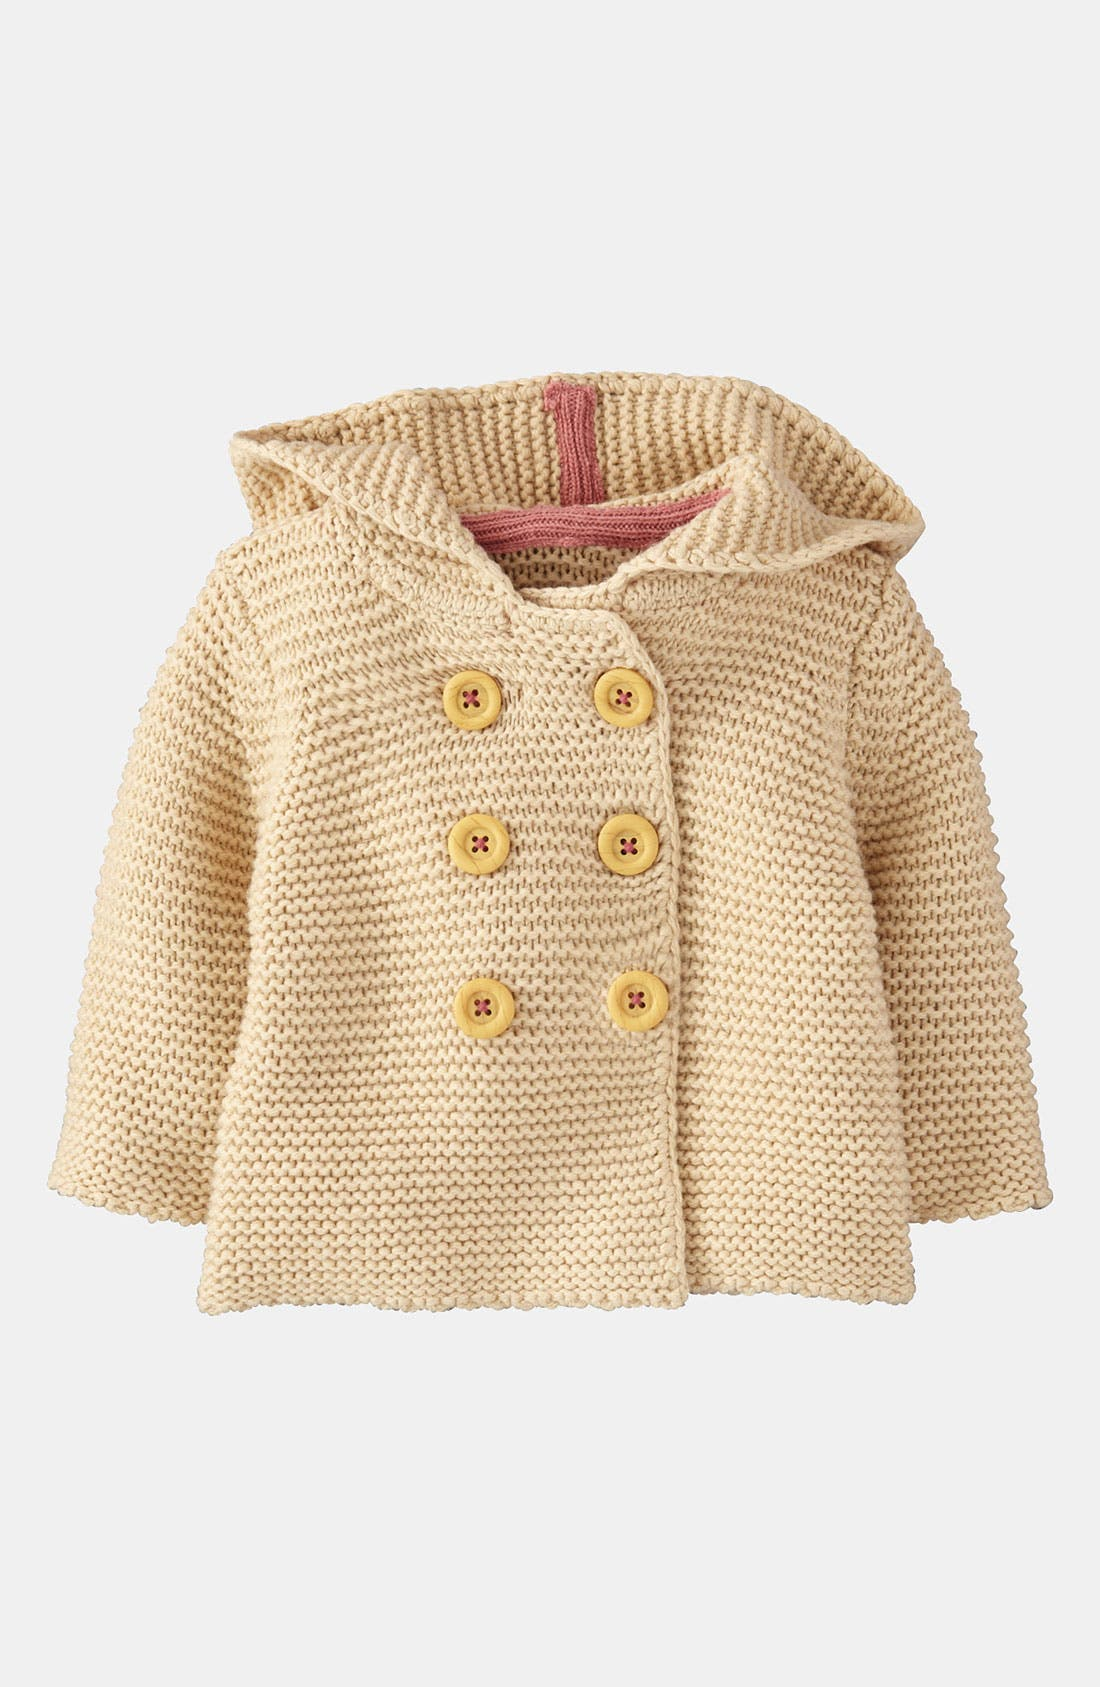 Alternate Image 1 Selected - Mini Boden Knit Jacket (Infant)